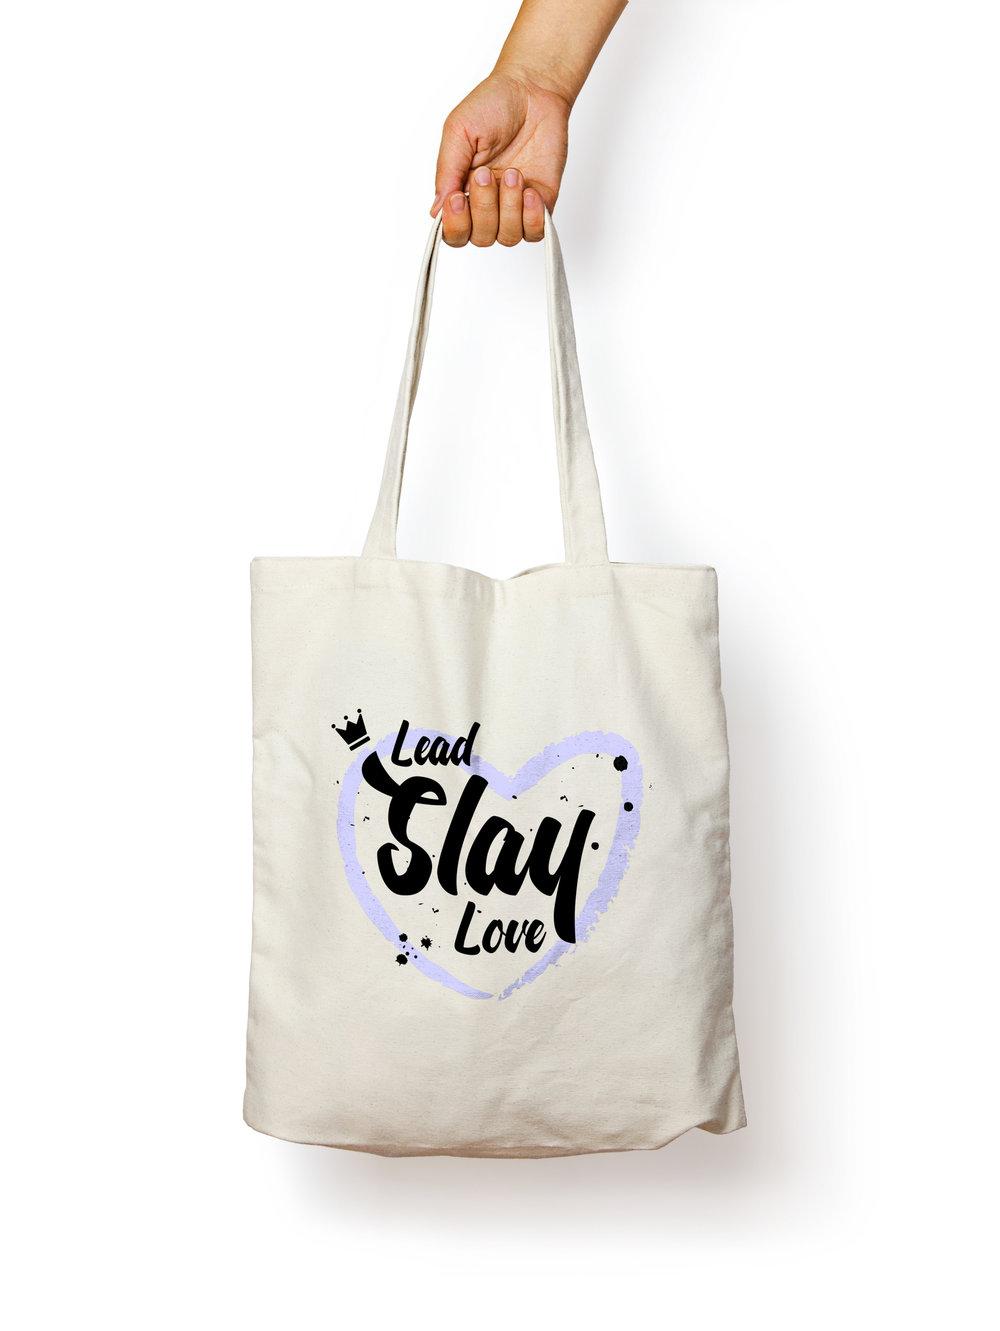 france francois lead slay love canvas tote bag